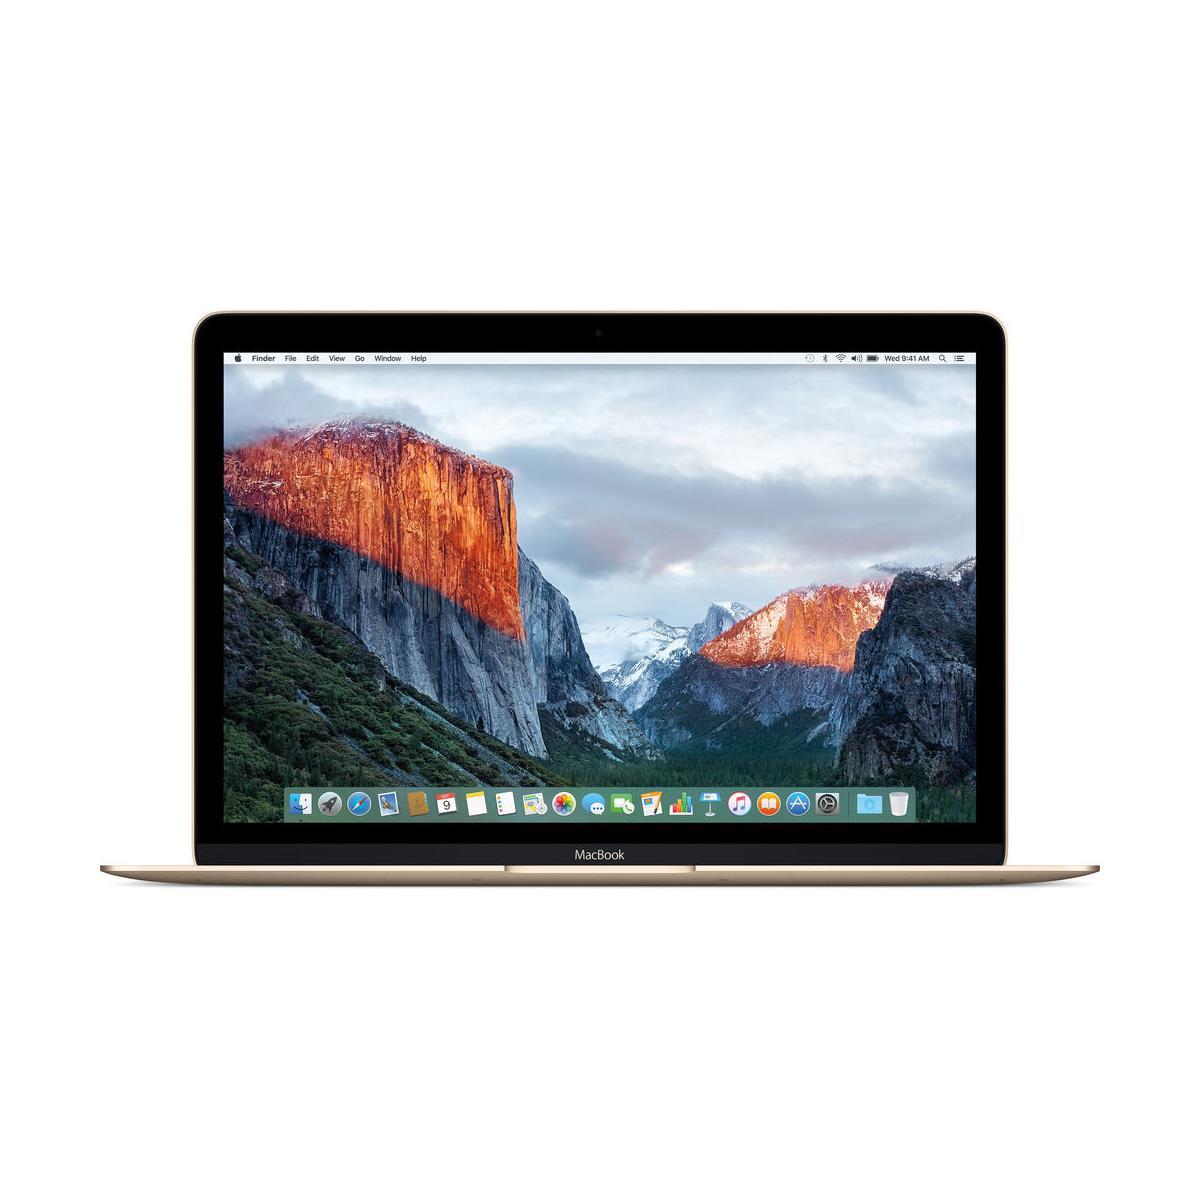 "Apple Macbook 12"" Laptop: Intel Core M3-6Y30, 8GB RAM, 256GB SSD $899 + free shipping"